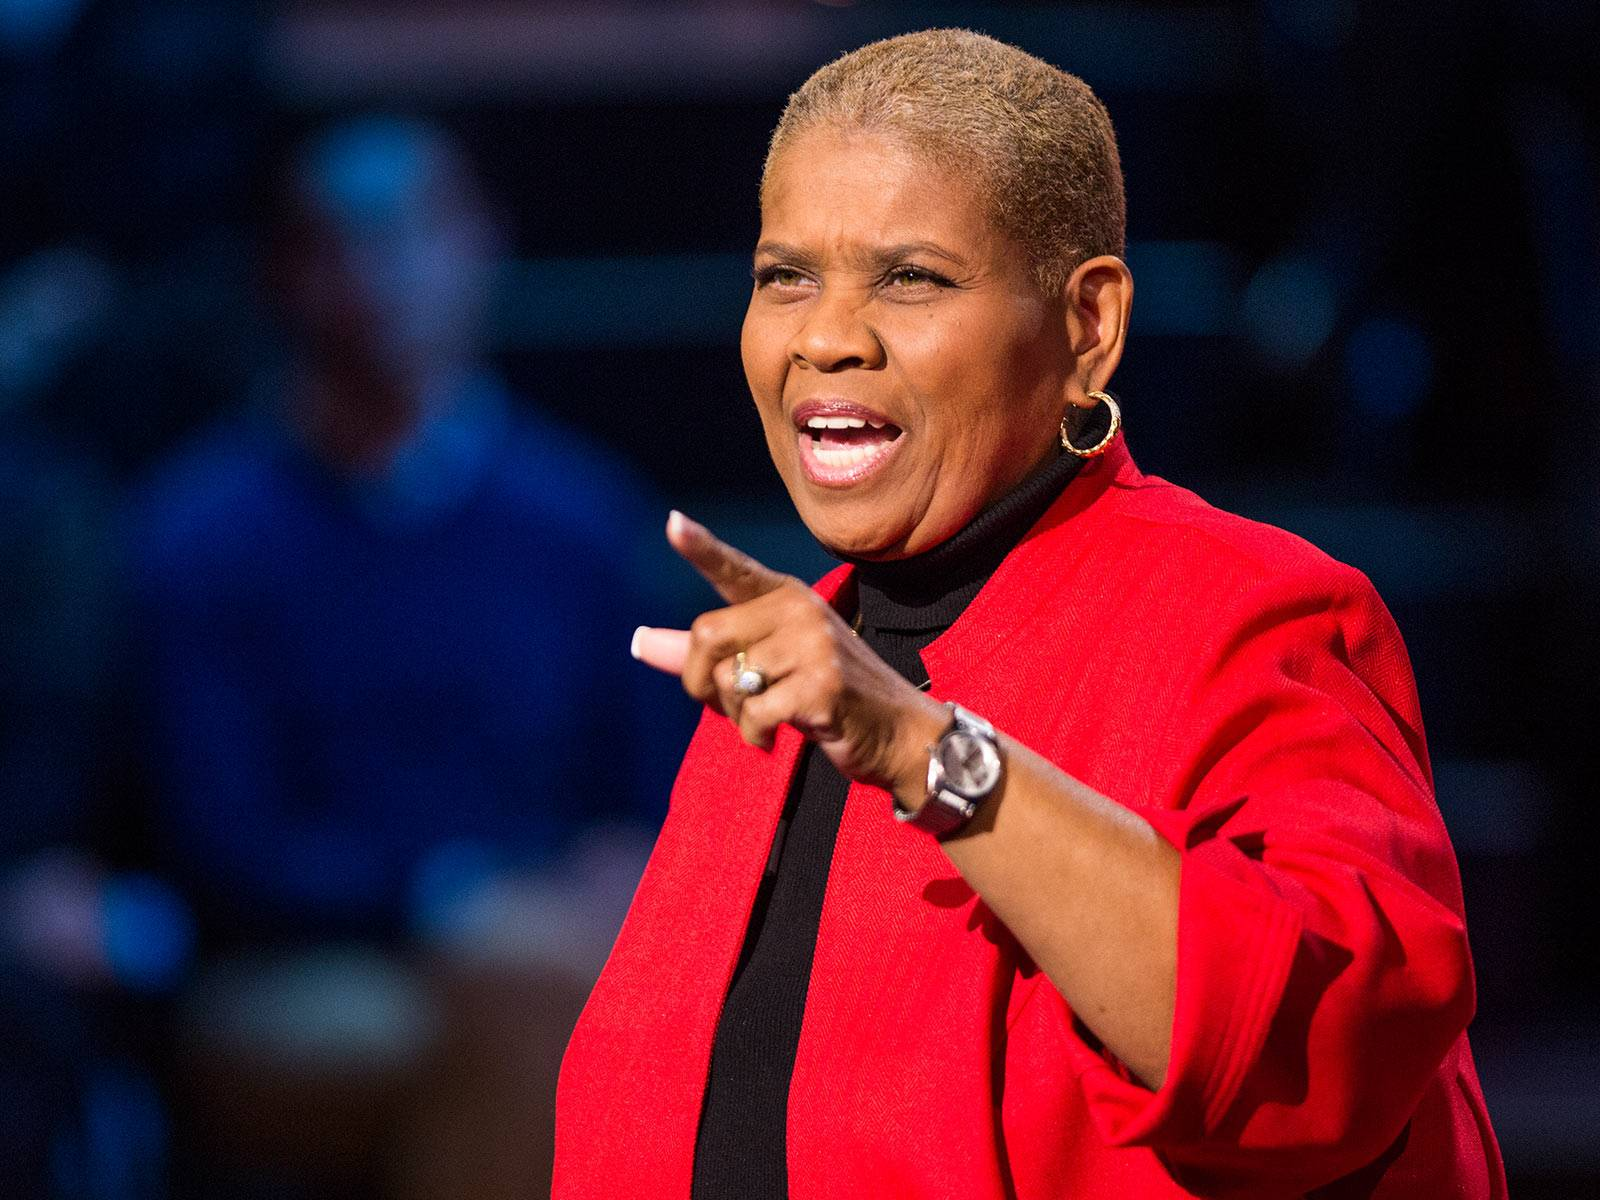 10 TED Talks from inspiring teachers